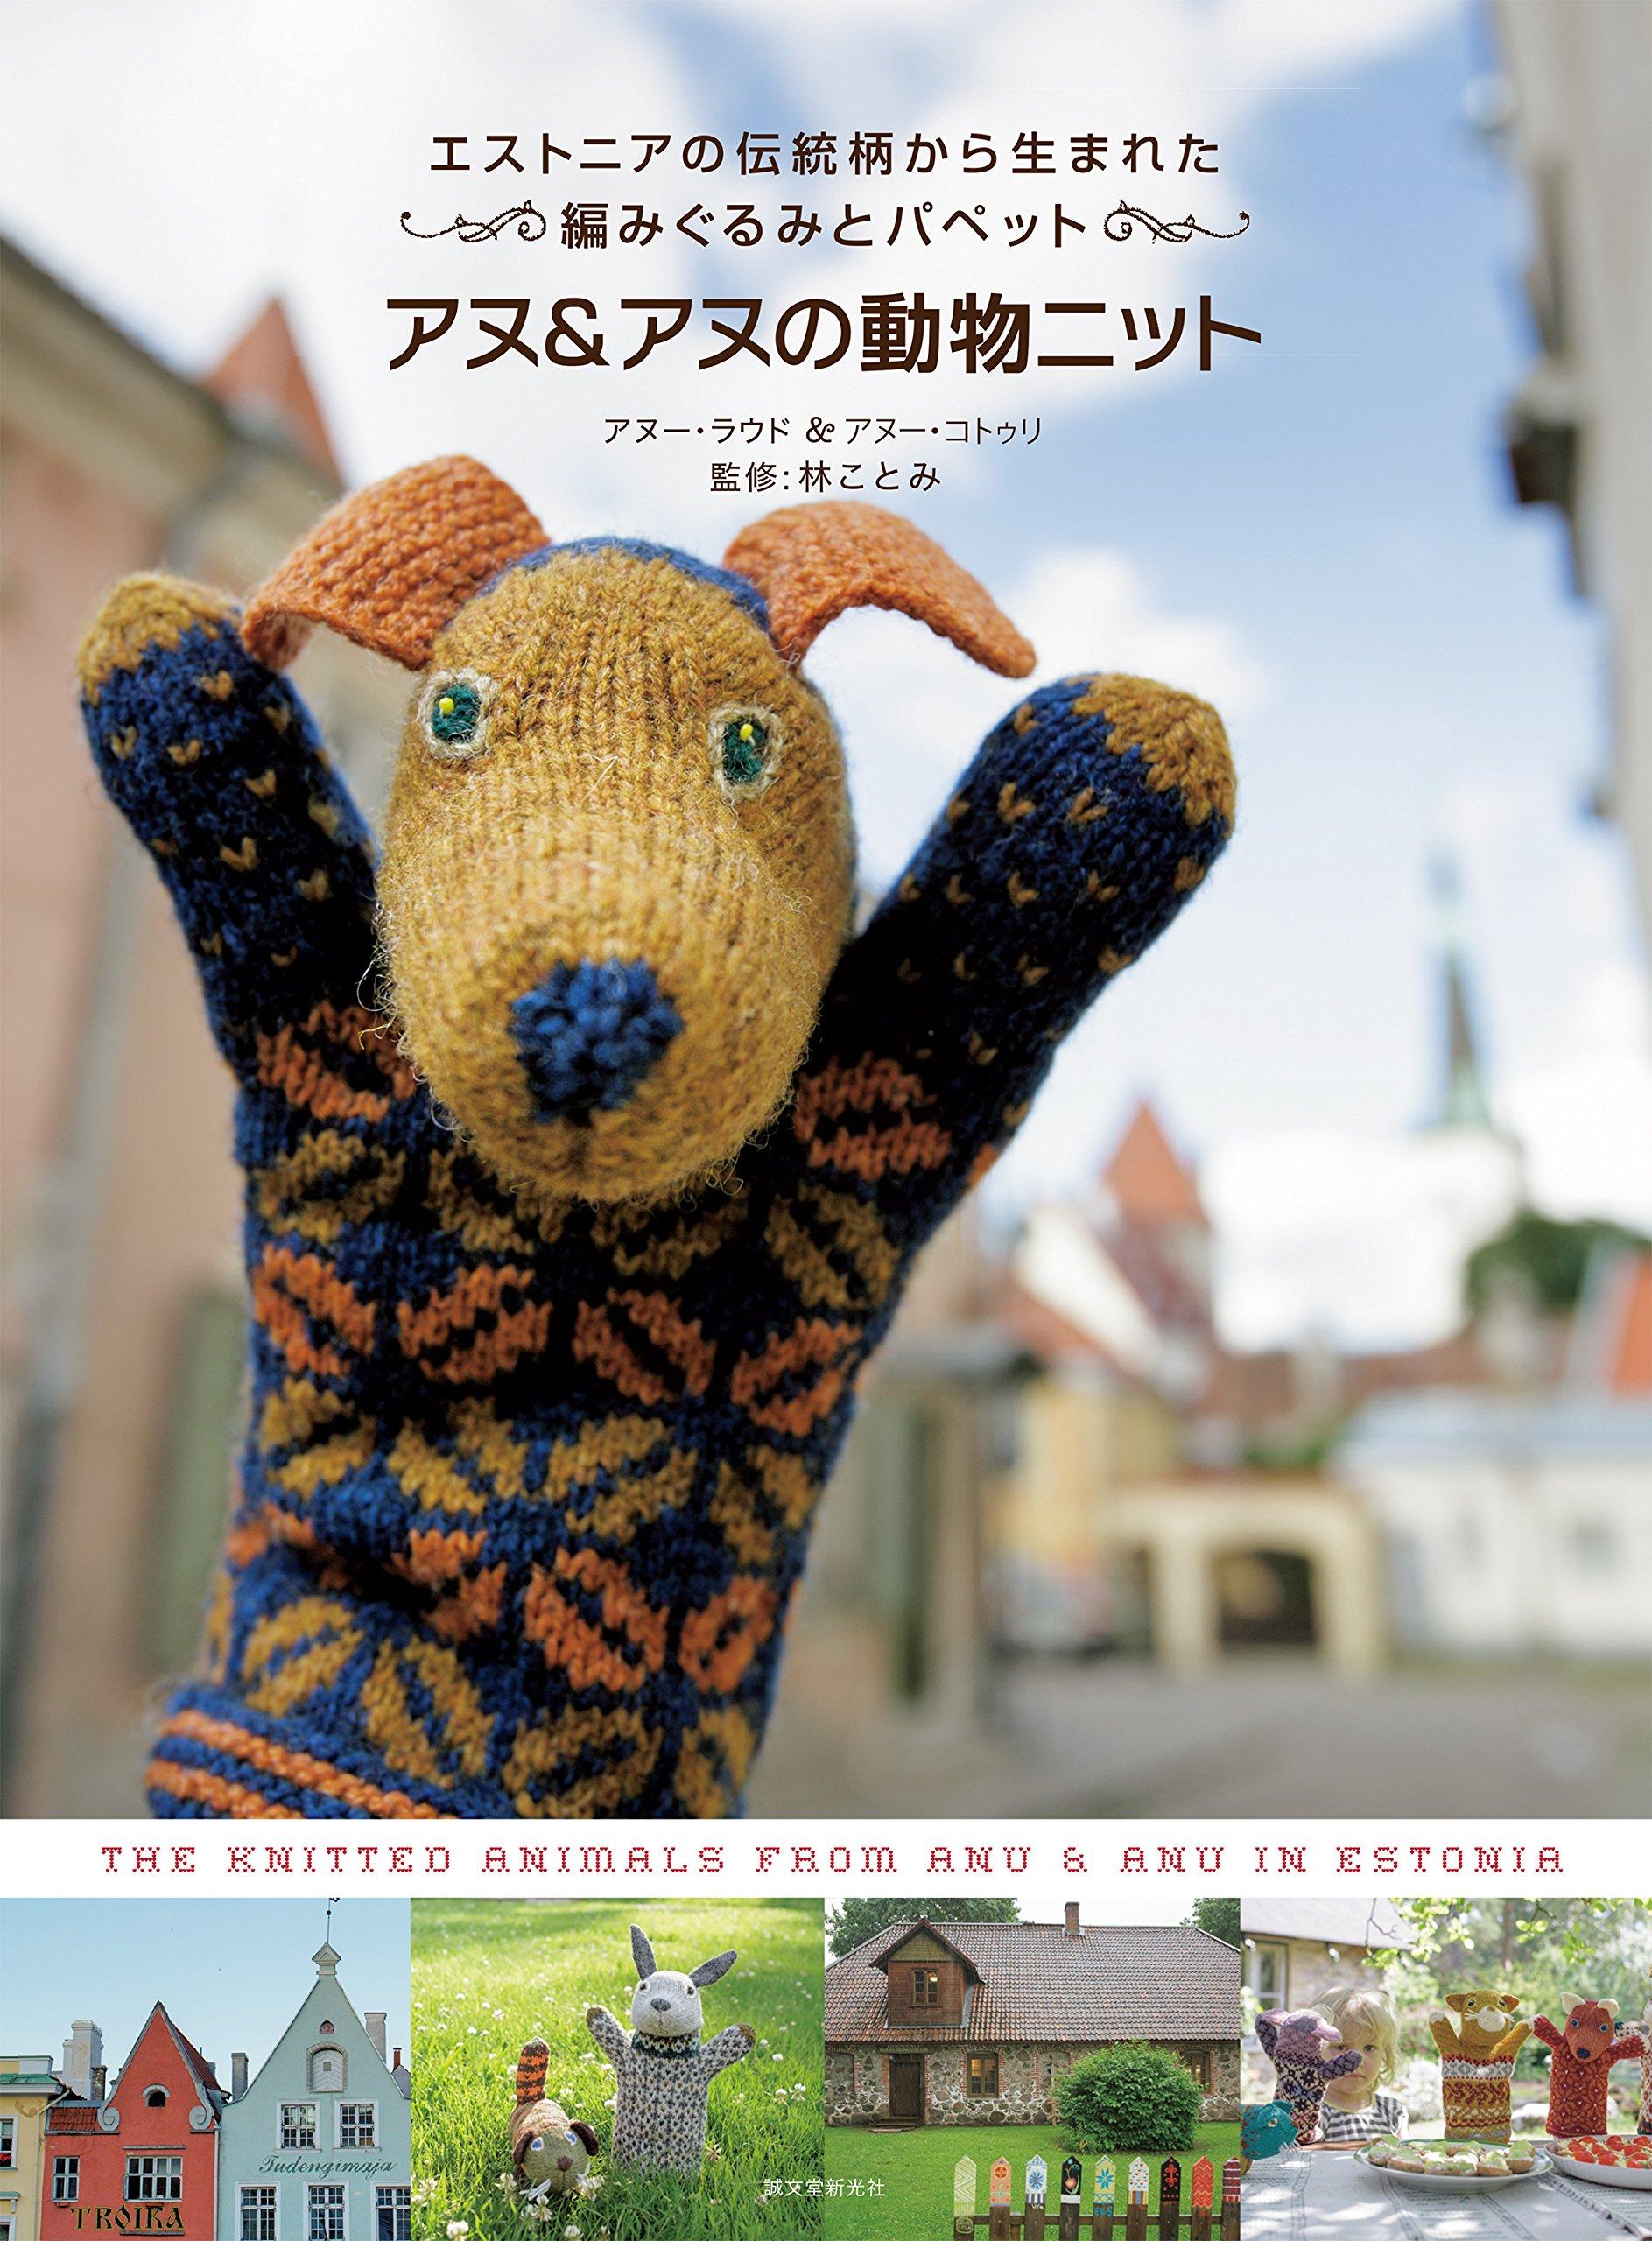 Anu animal knit: from Estonia traditional pattern